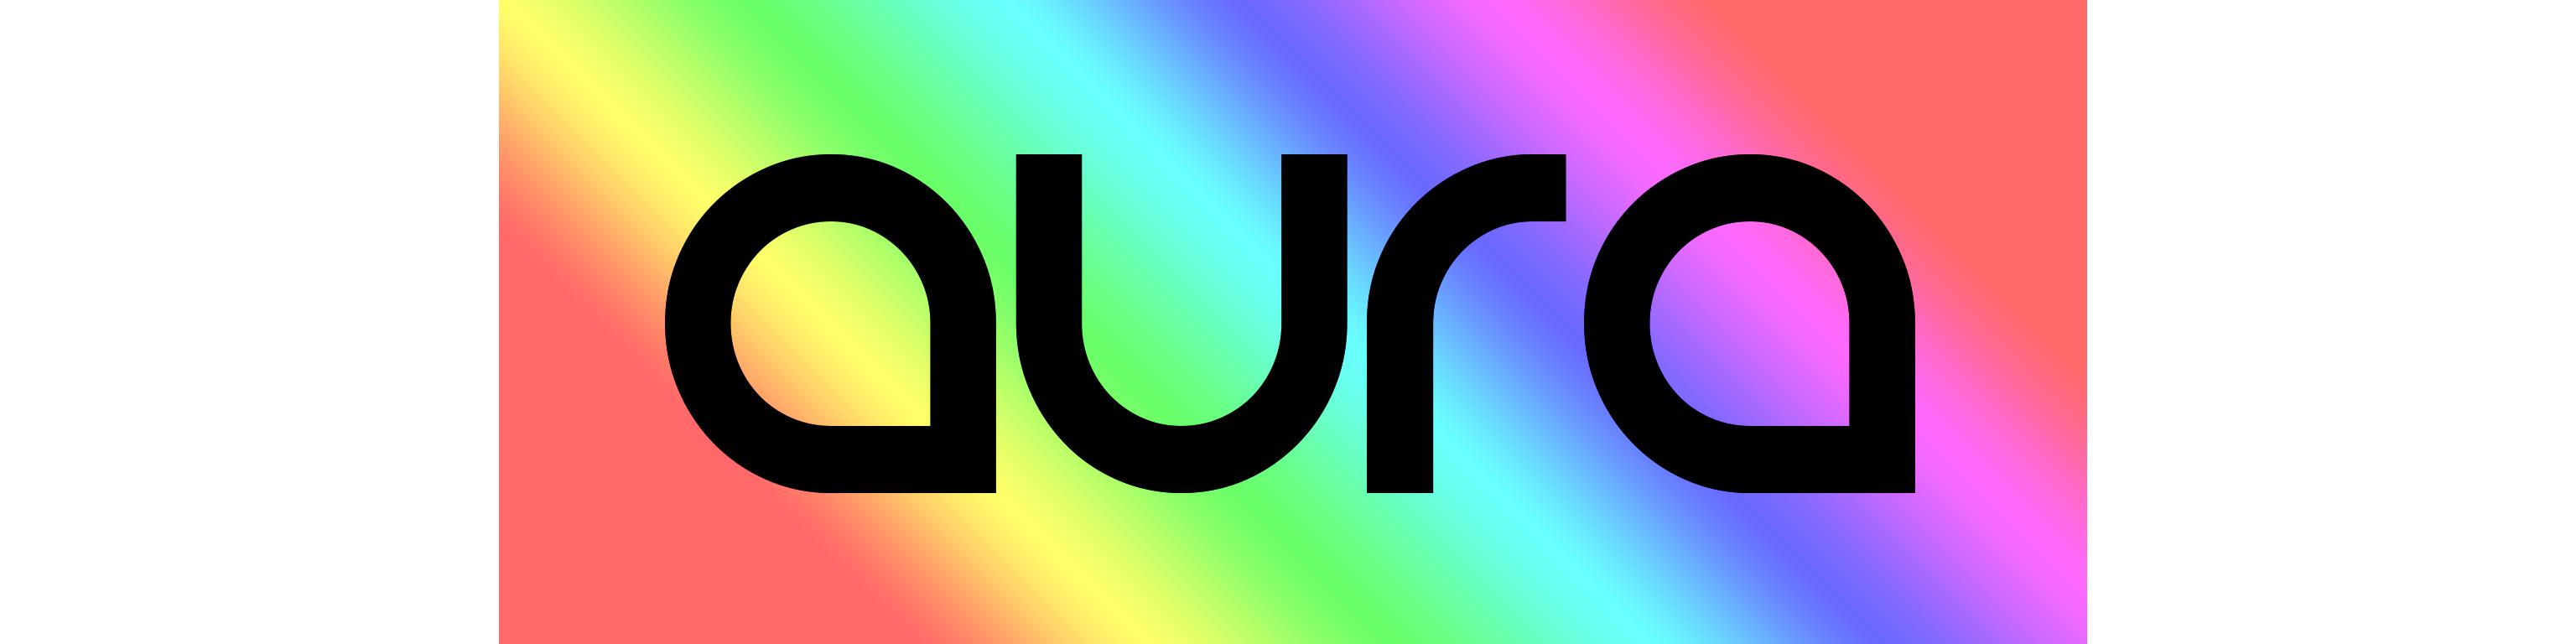 Aura - Volumetric Lighting for Unity